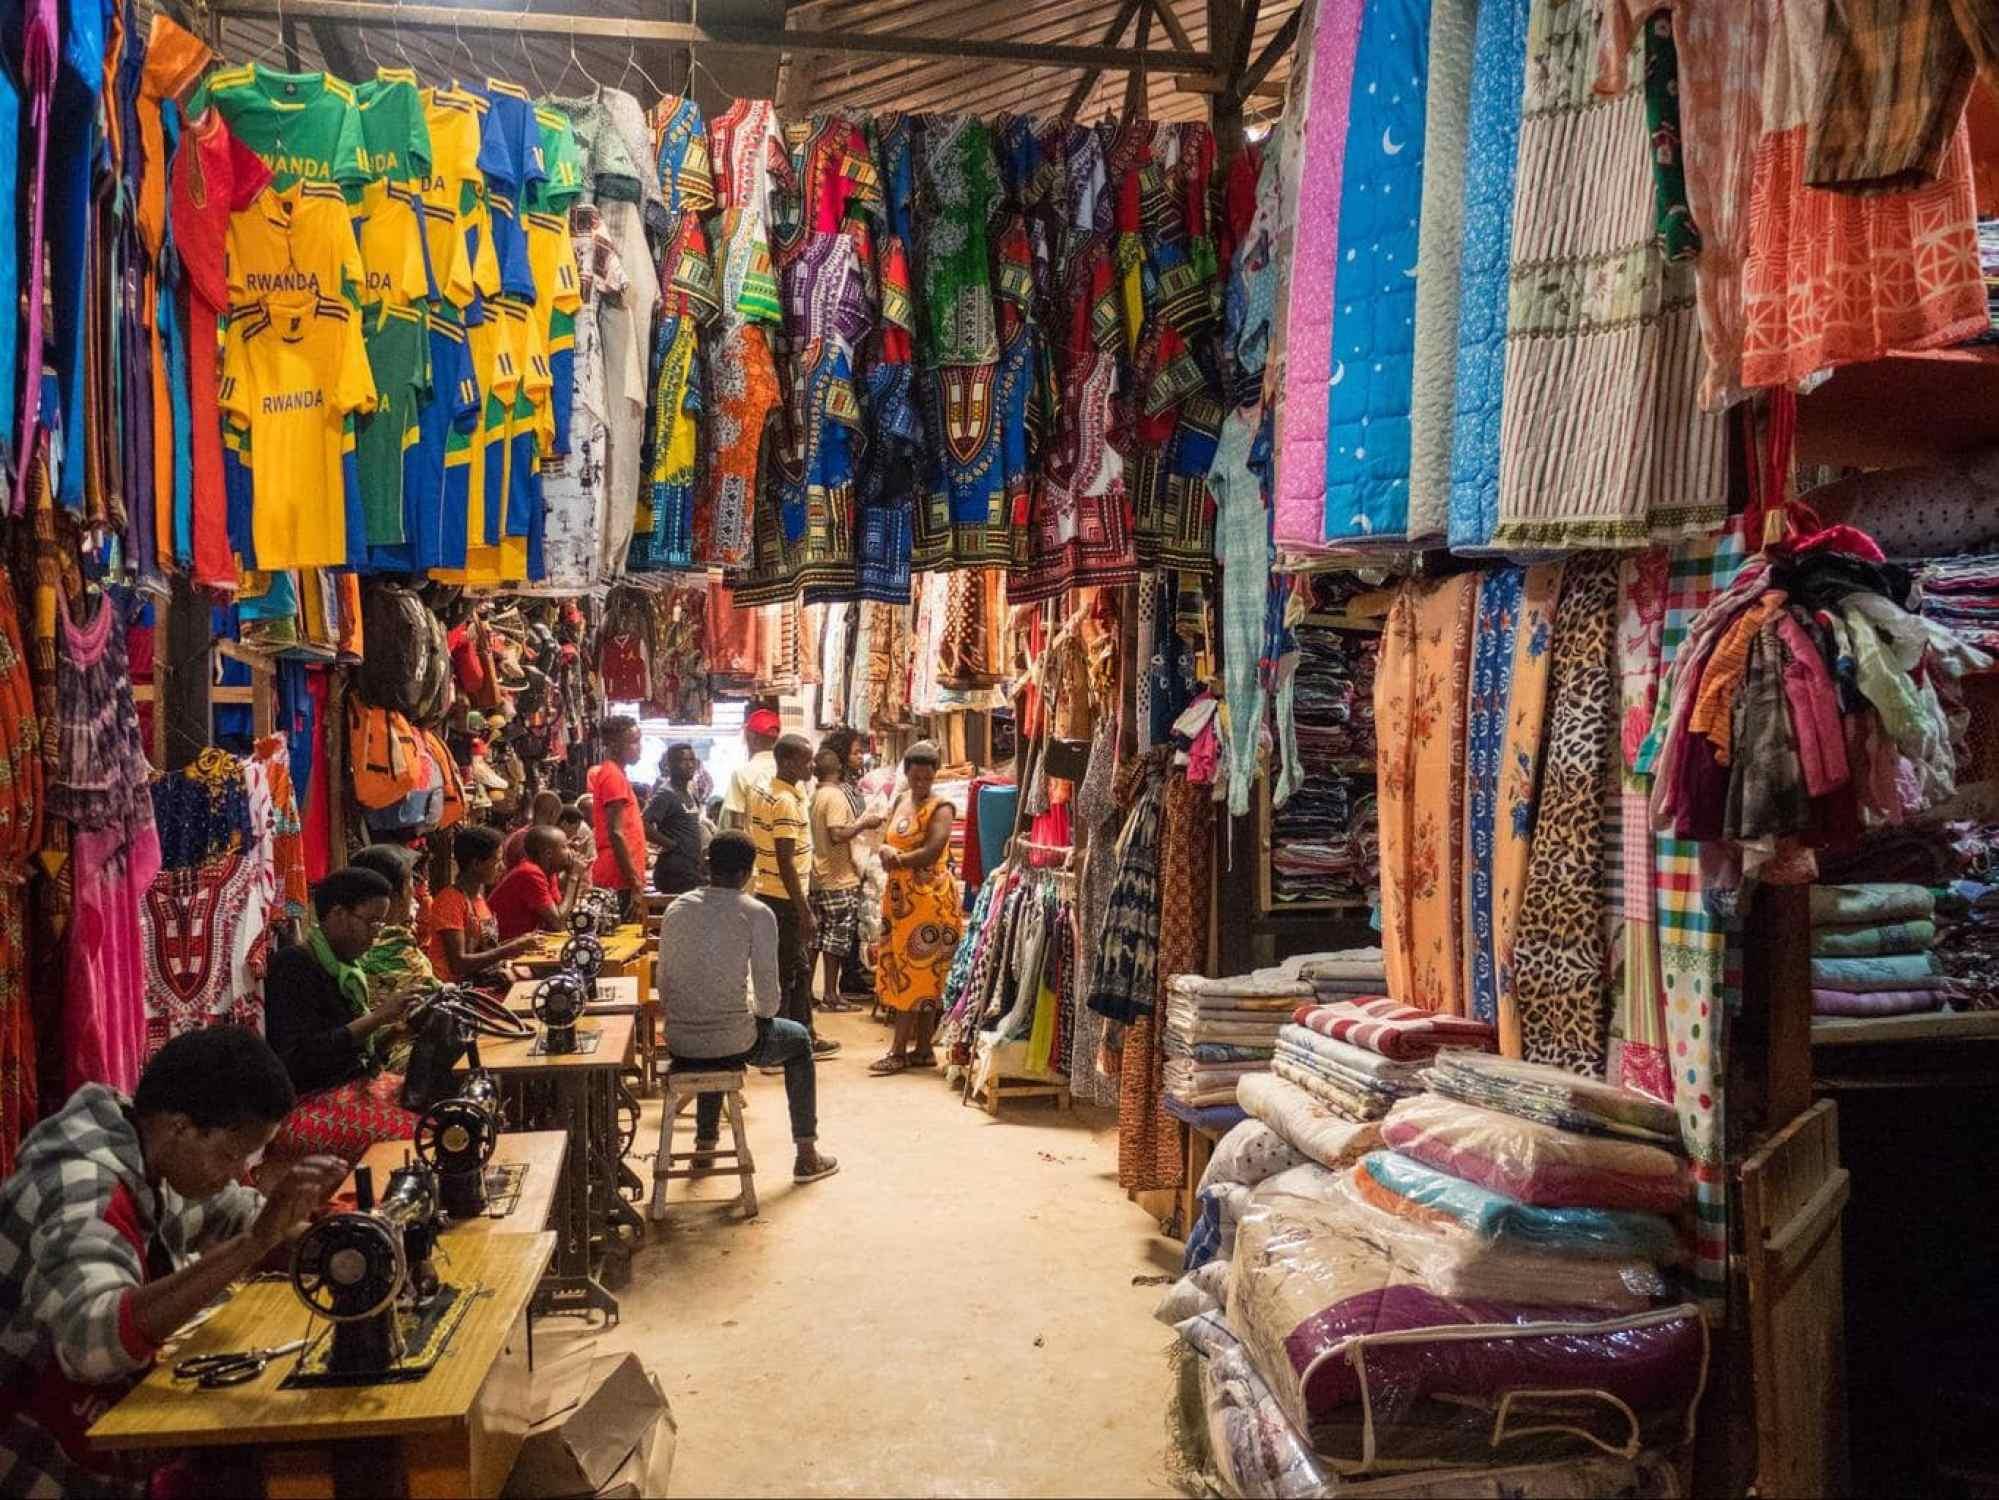 Fabrics and clothes at Kimironko Market